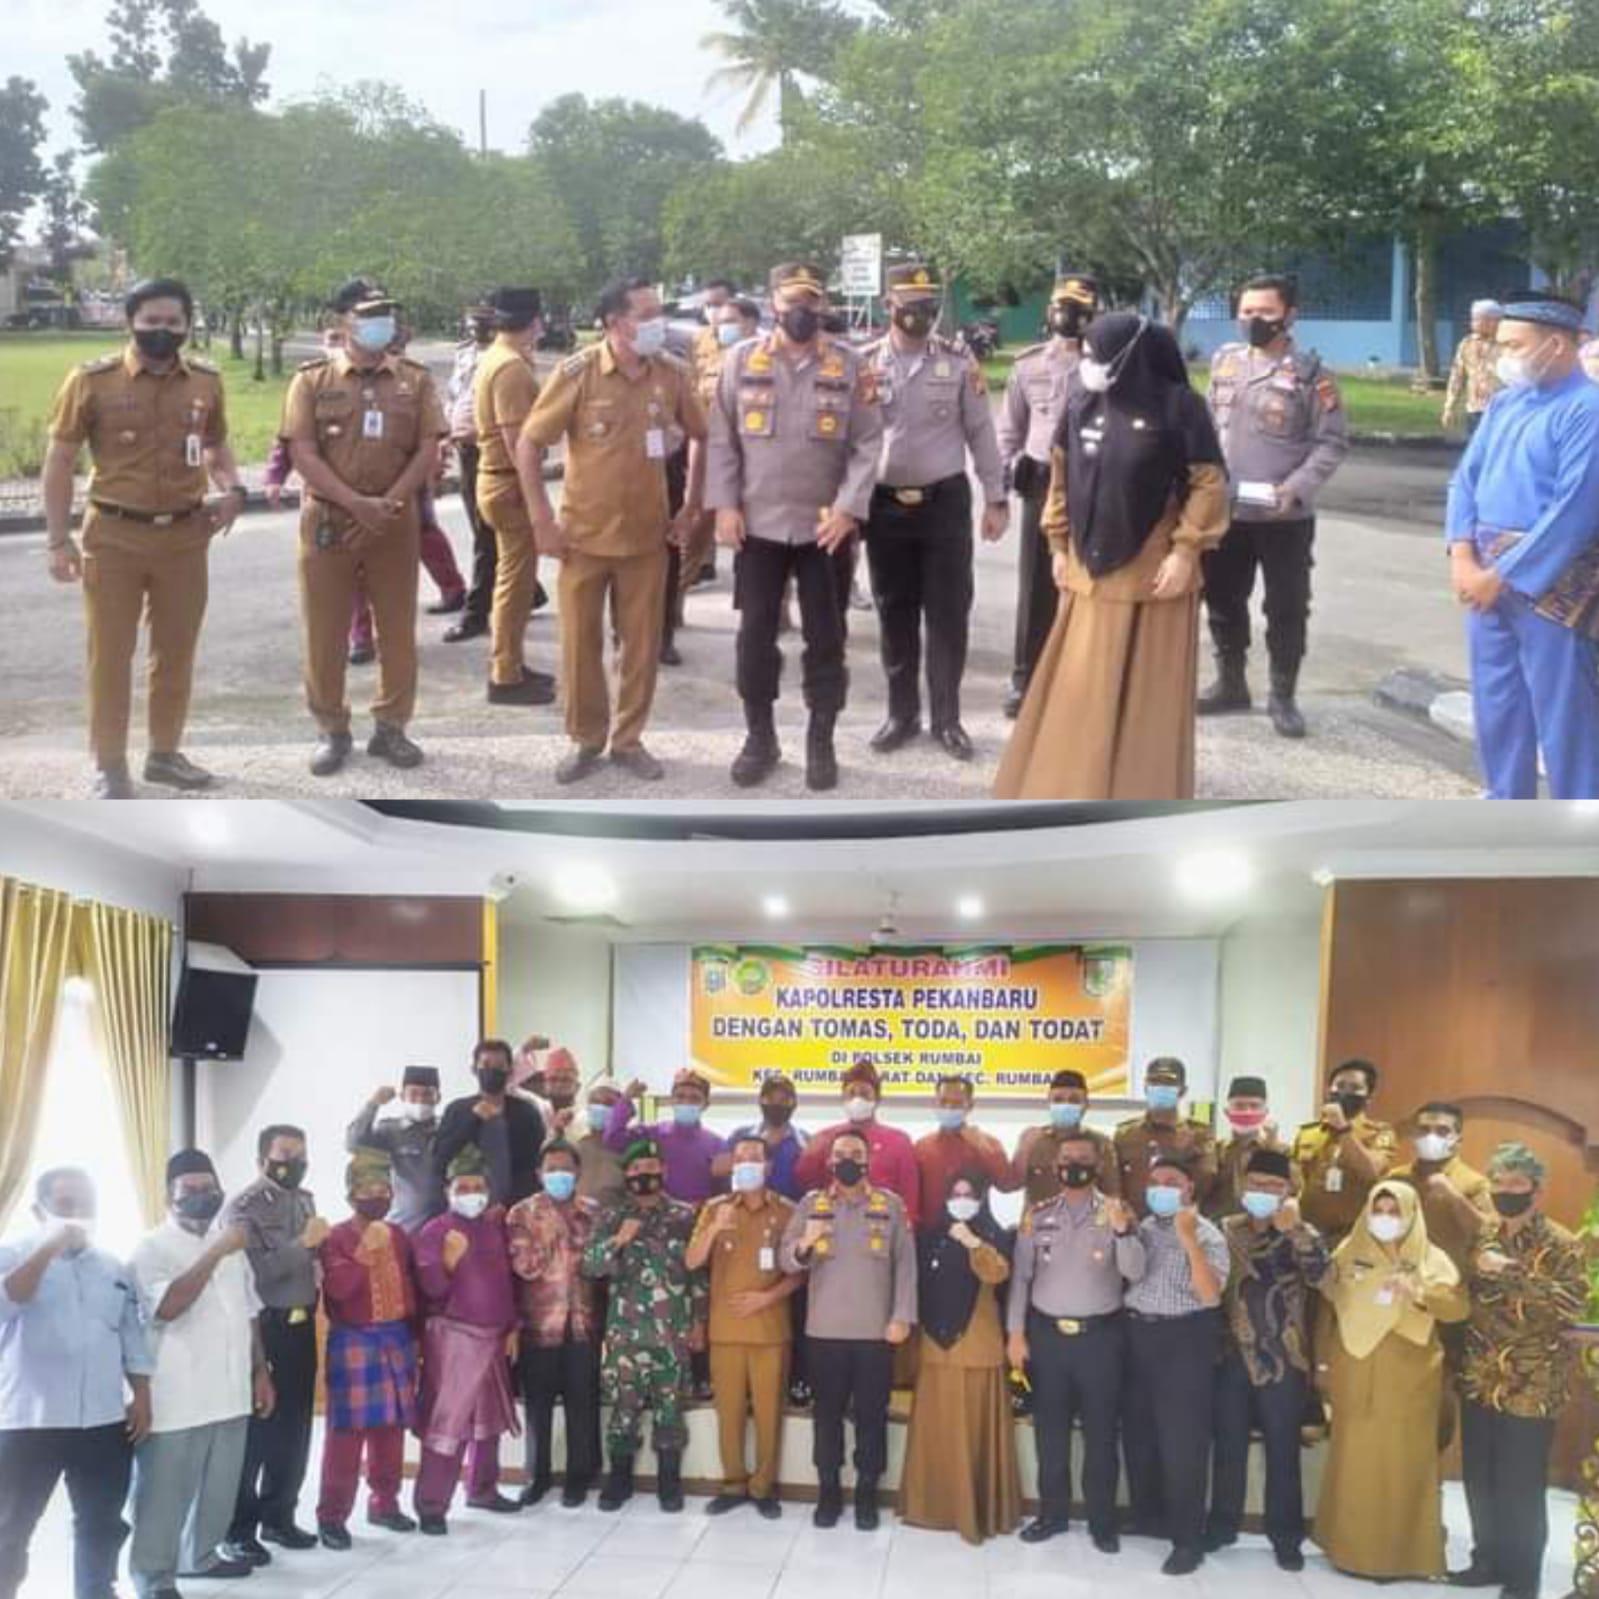 Silaturahmi, Kapolresta Ajak Tokoh Masyarakat Jaga Harkamtibmas